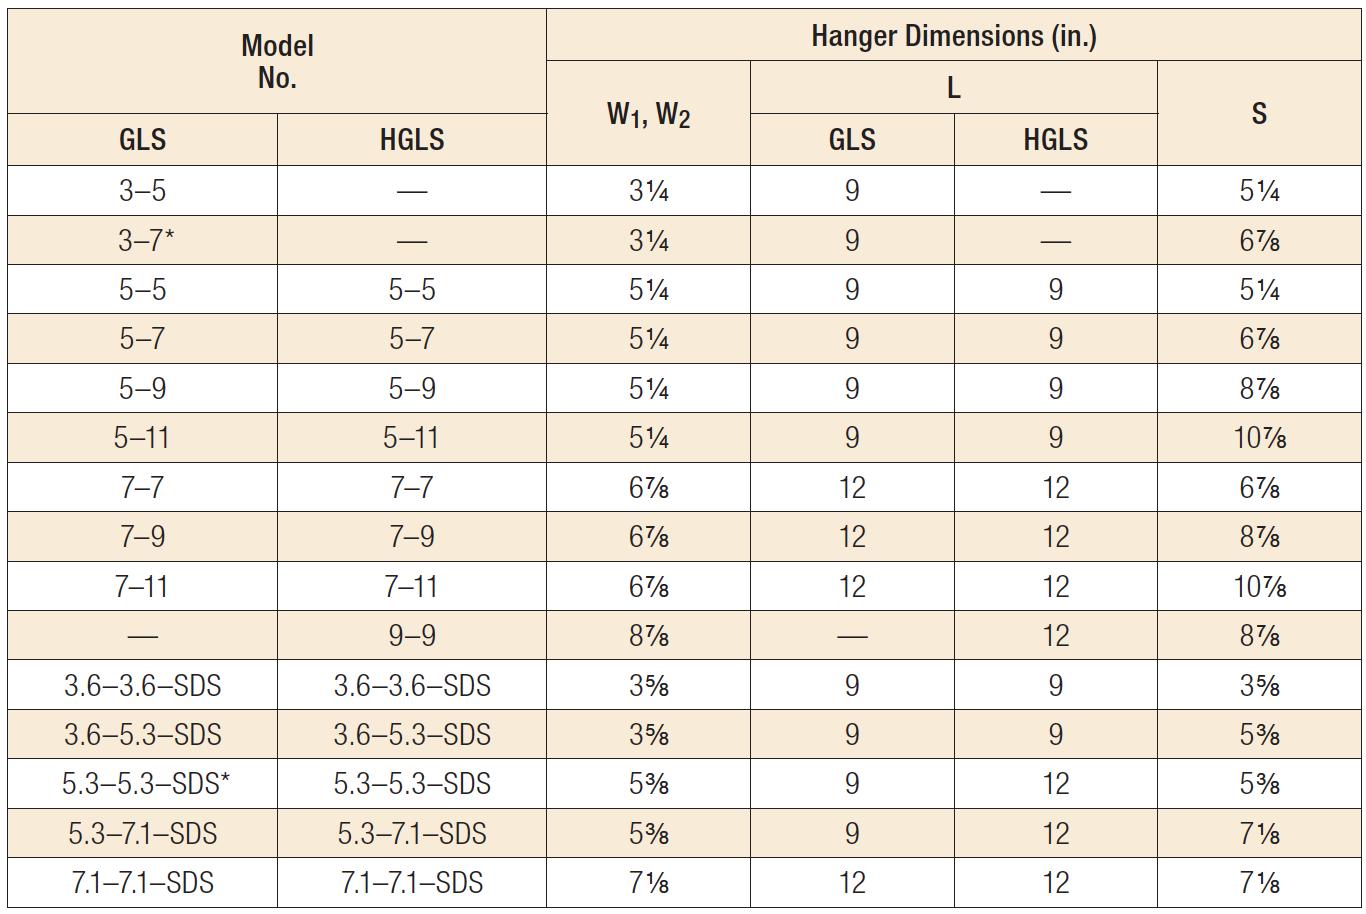 HGLT/HGLTV/HGLS Heavy-Duty Top-Flange Hangers Product Table